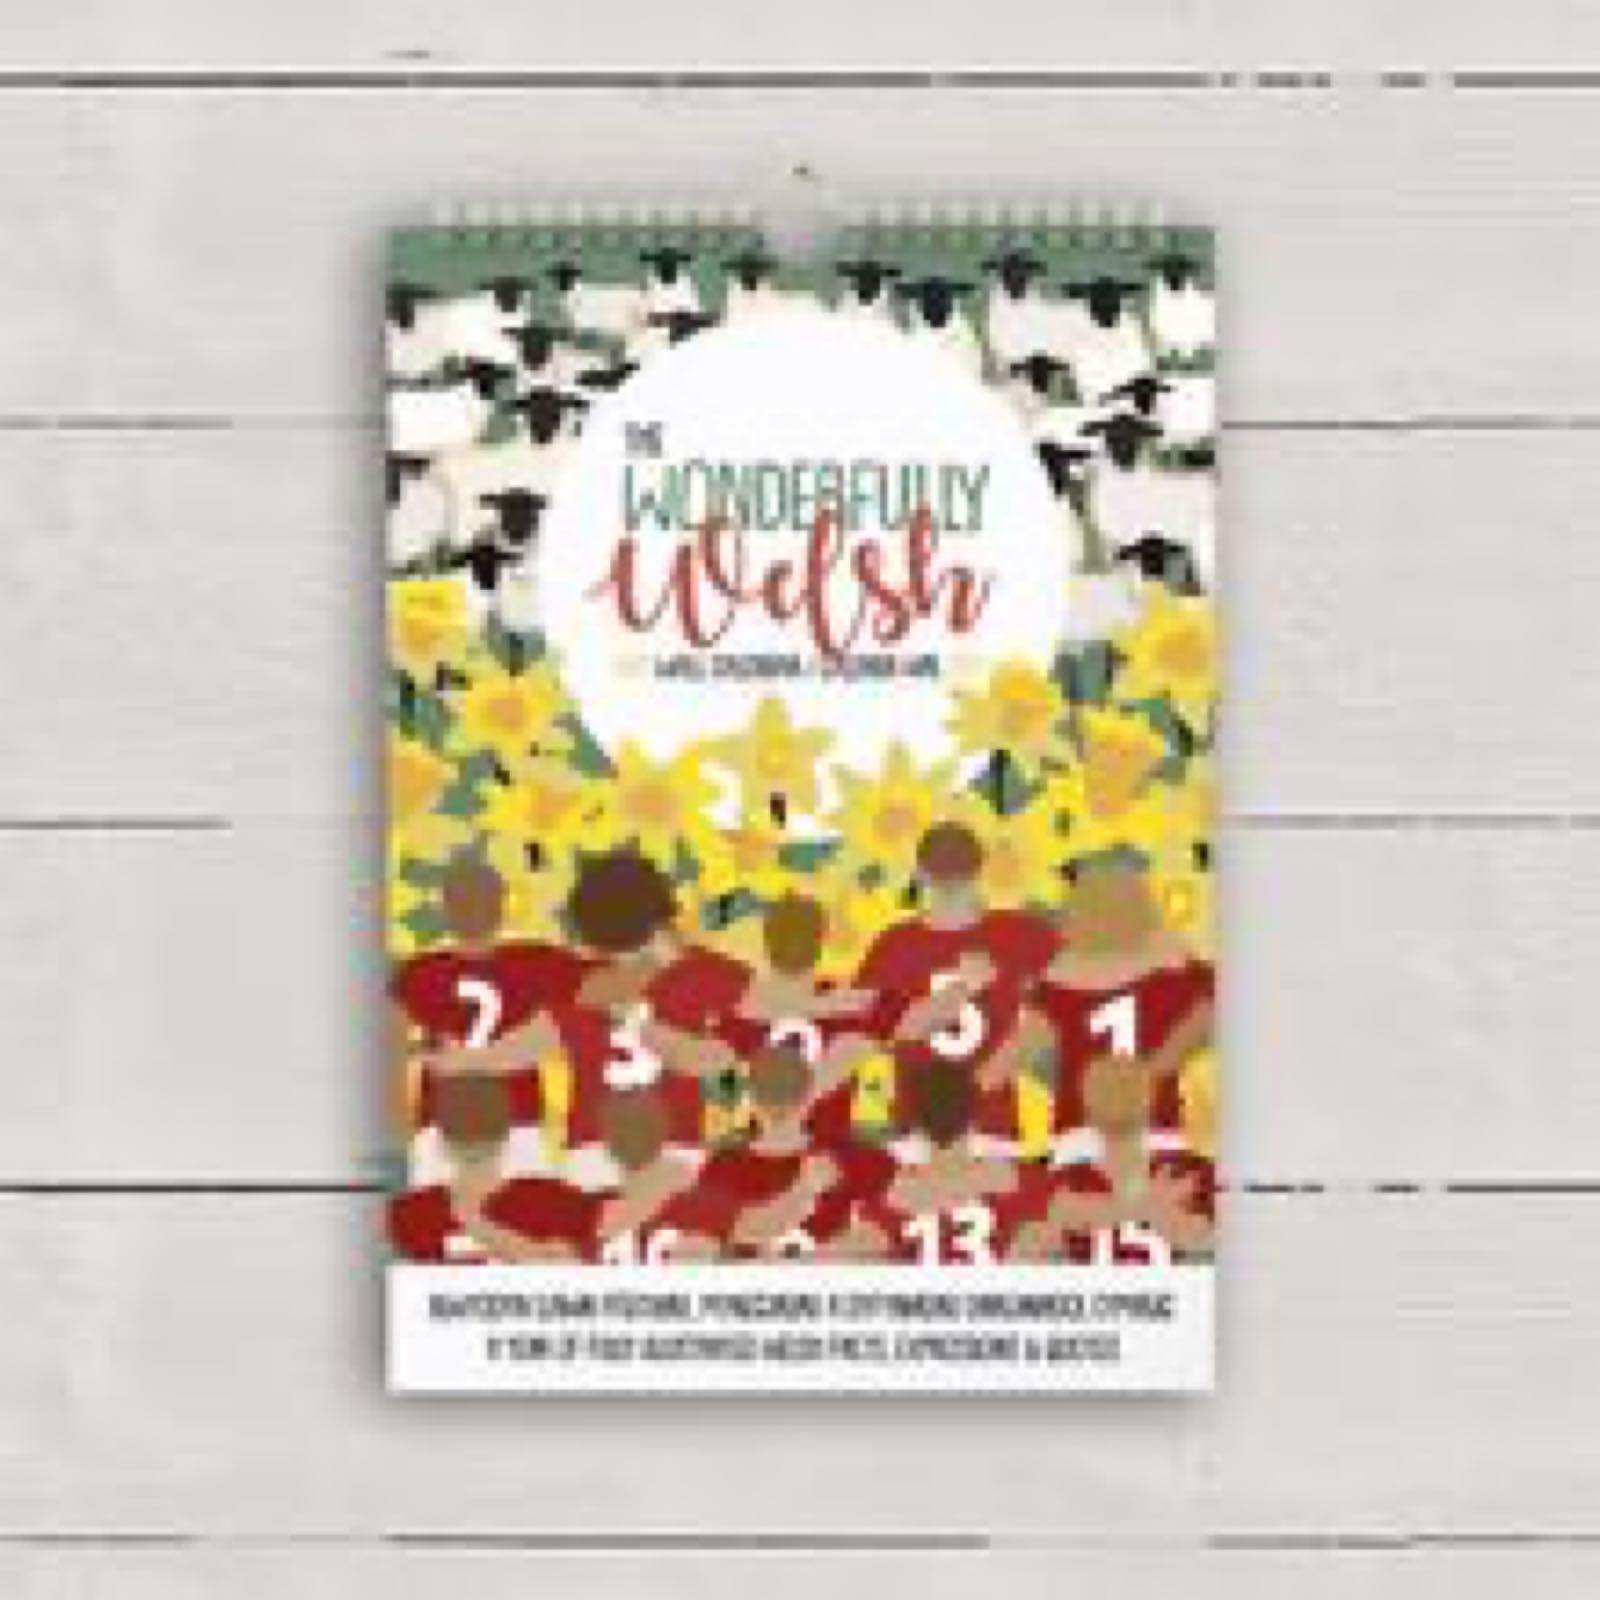 Wonderfully Welsh Wall Calendar